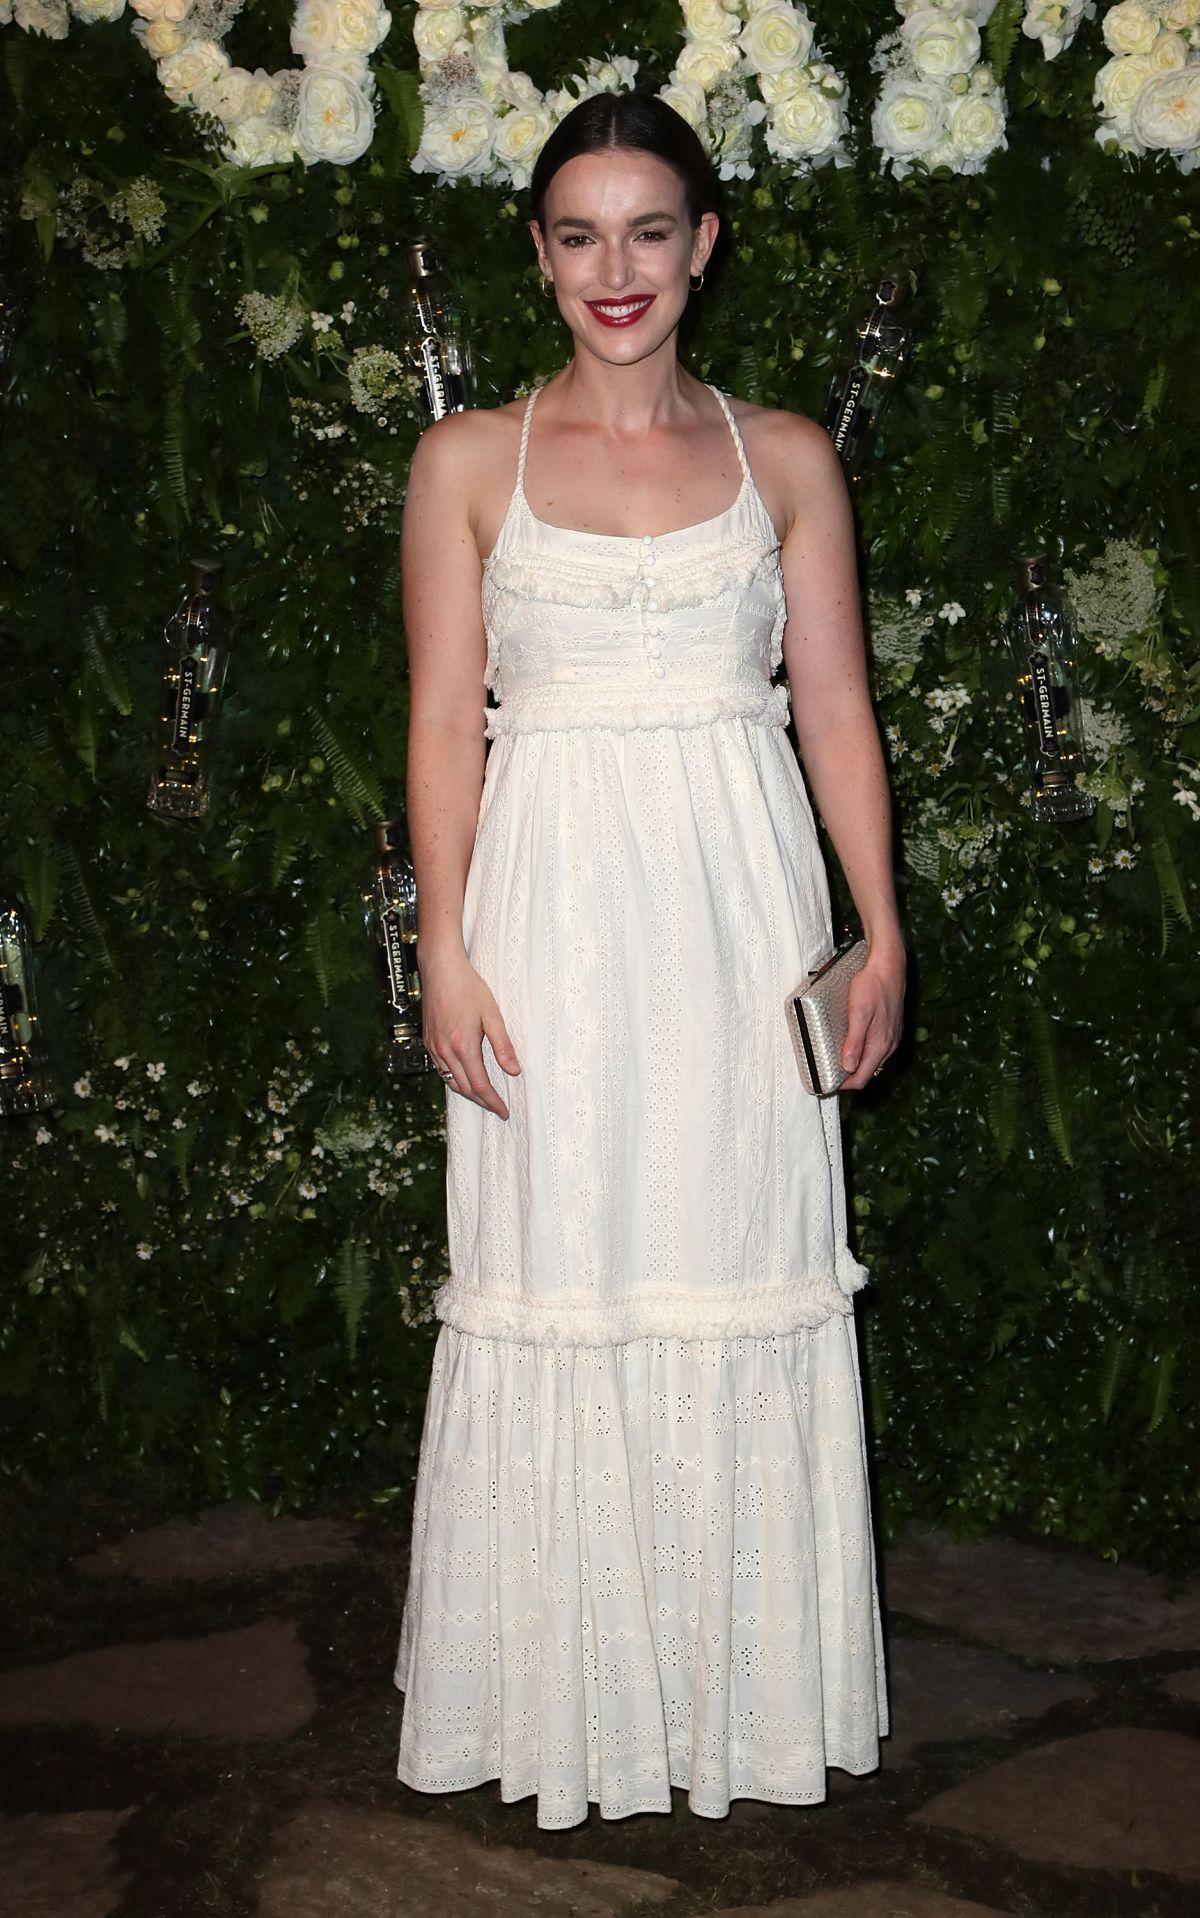 ELIZABETH HENSTRIDGE at Maison St-germain Event in Los Angeles 08/02/2017